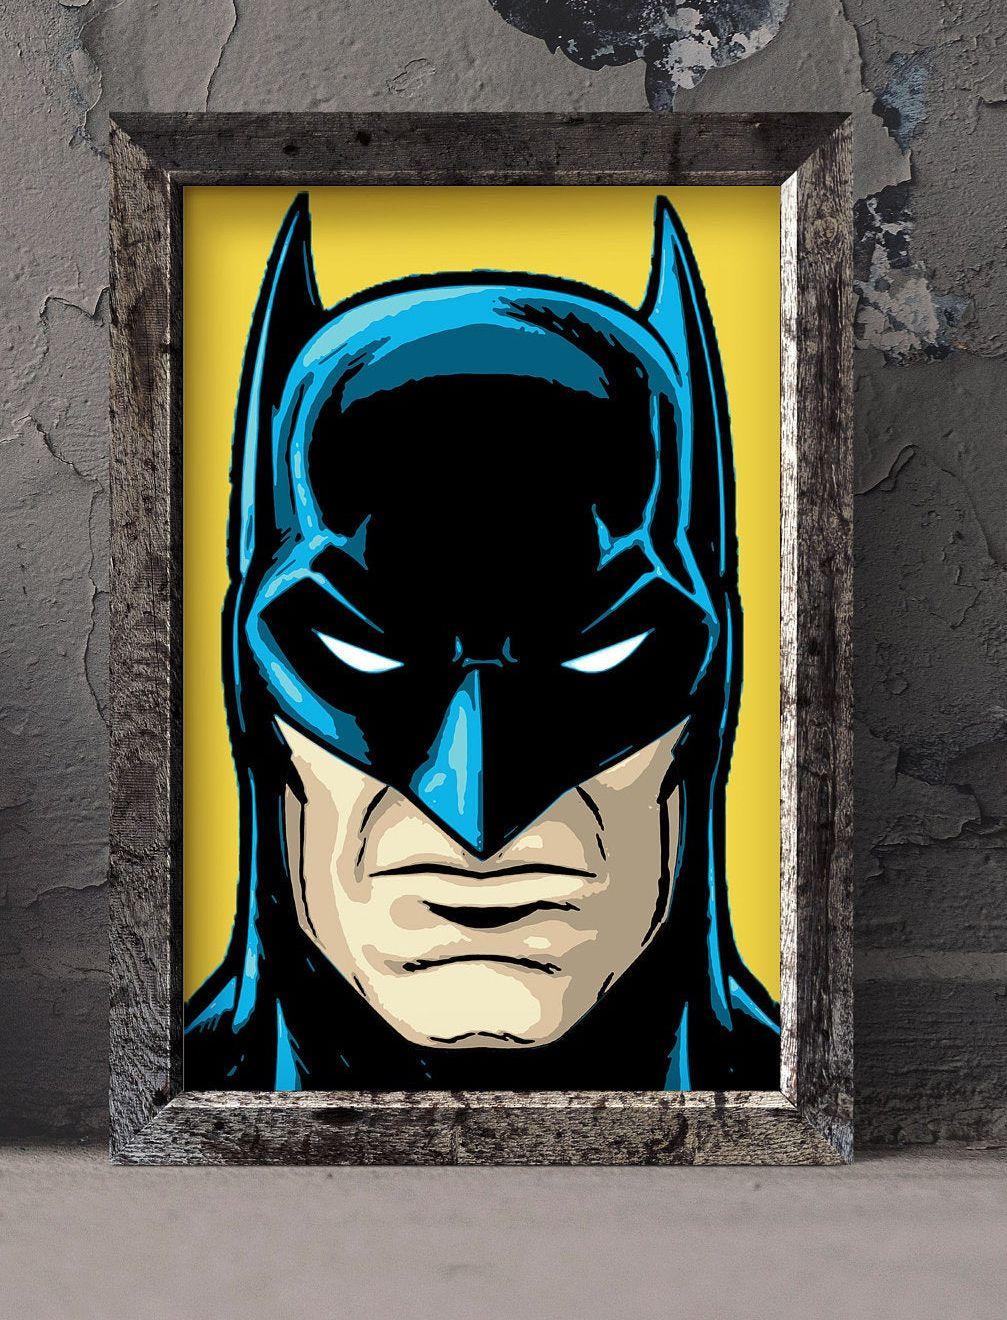 Batman Superhero Crime Fighter Justice League Decal Wall Art Sticker Picture